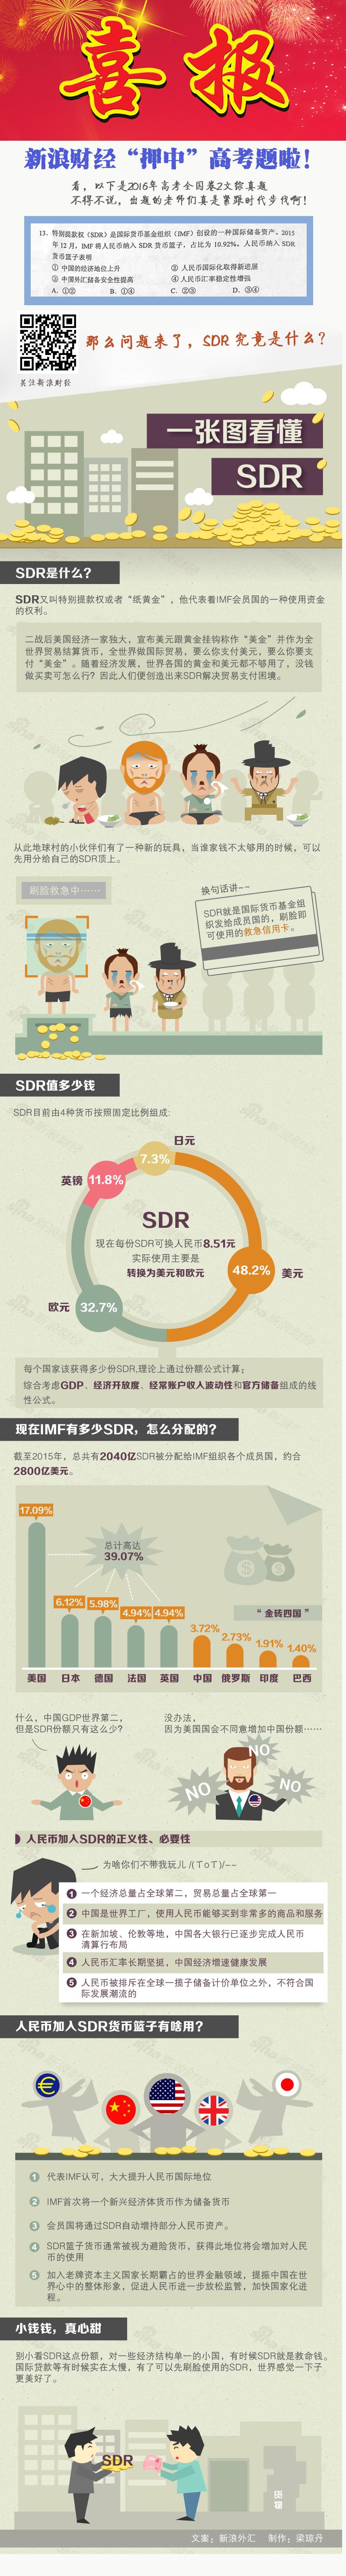 SDR就是一张刷脸救急信用卡